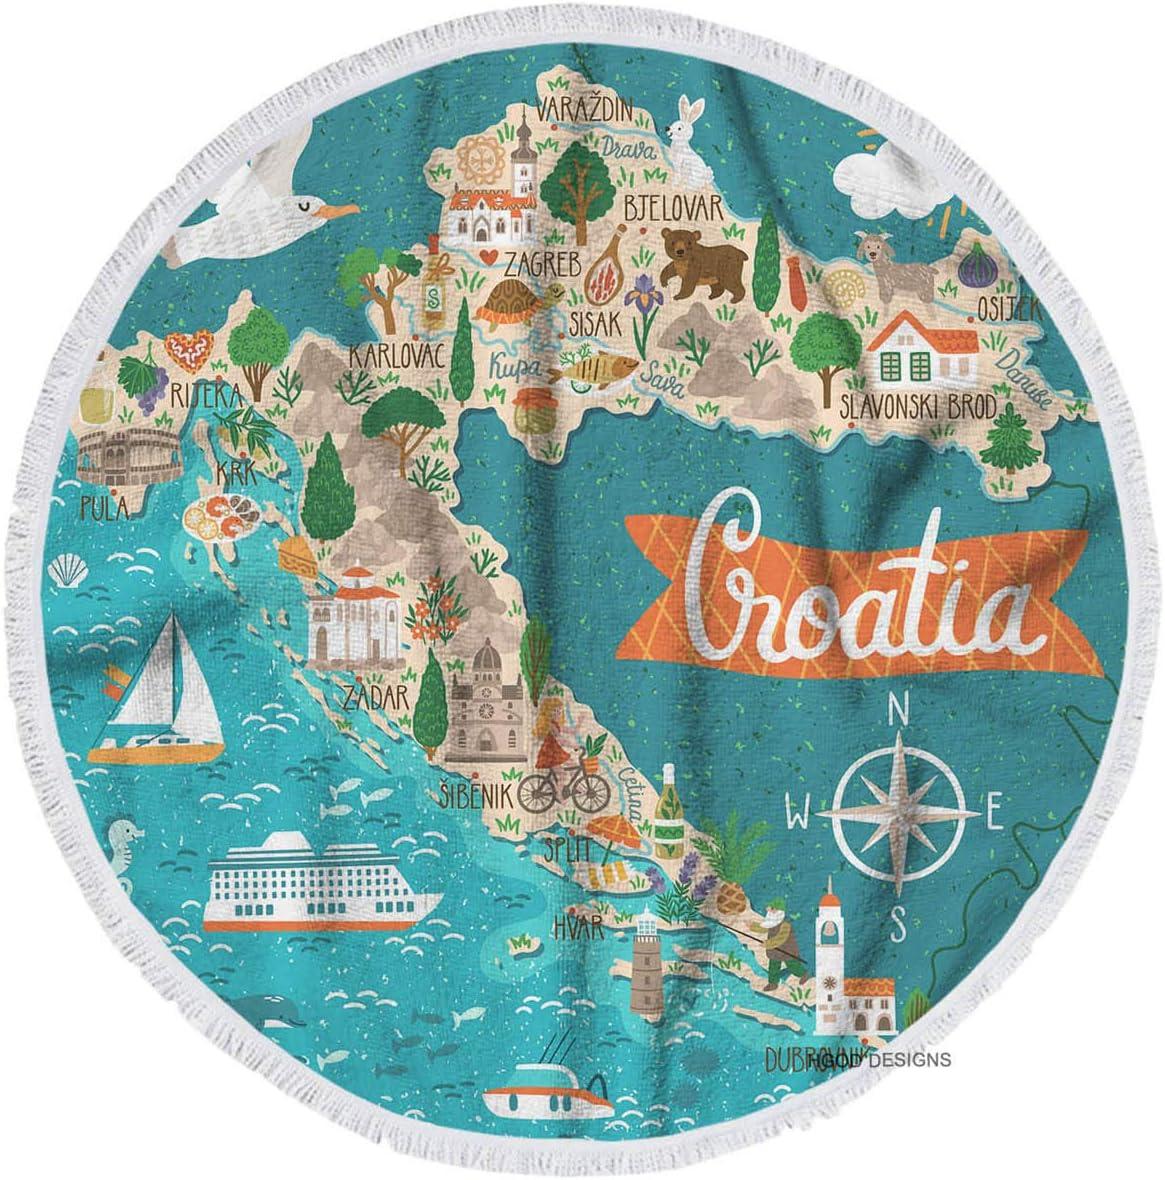 HGOD DESIGNS Beach Towel Map,Croatia Map Travel with Croatian Landmarks People Food and Plants Round Beach Towel Throw Blanket Towel Yoga Mat 63 Inch(160 cm) Diameter Include Tassels